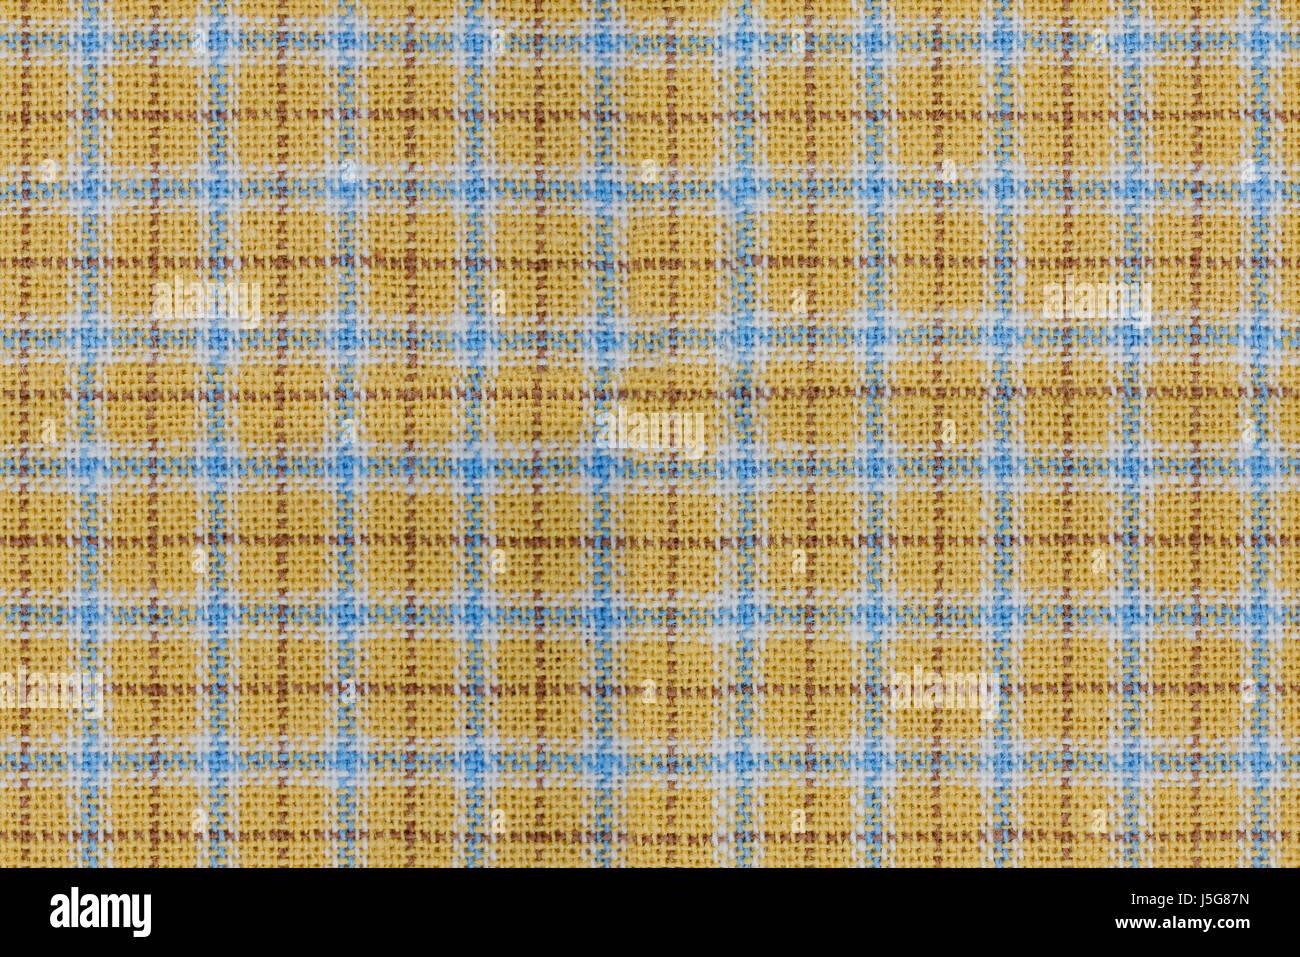 Blue Yellow Fabric Weave Seamless Stock Photos & Blue Yellow ...